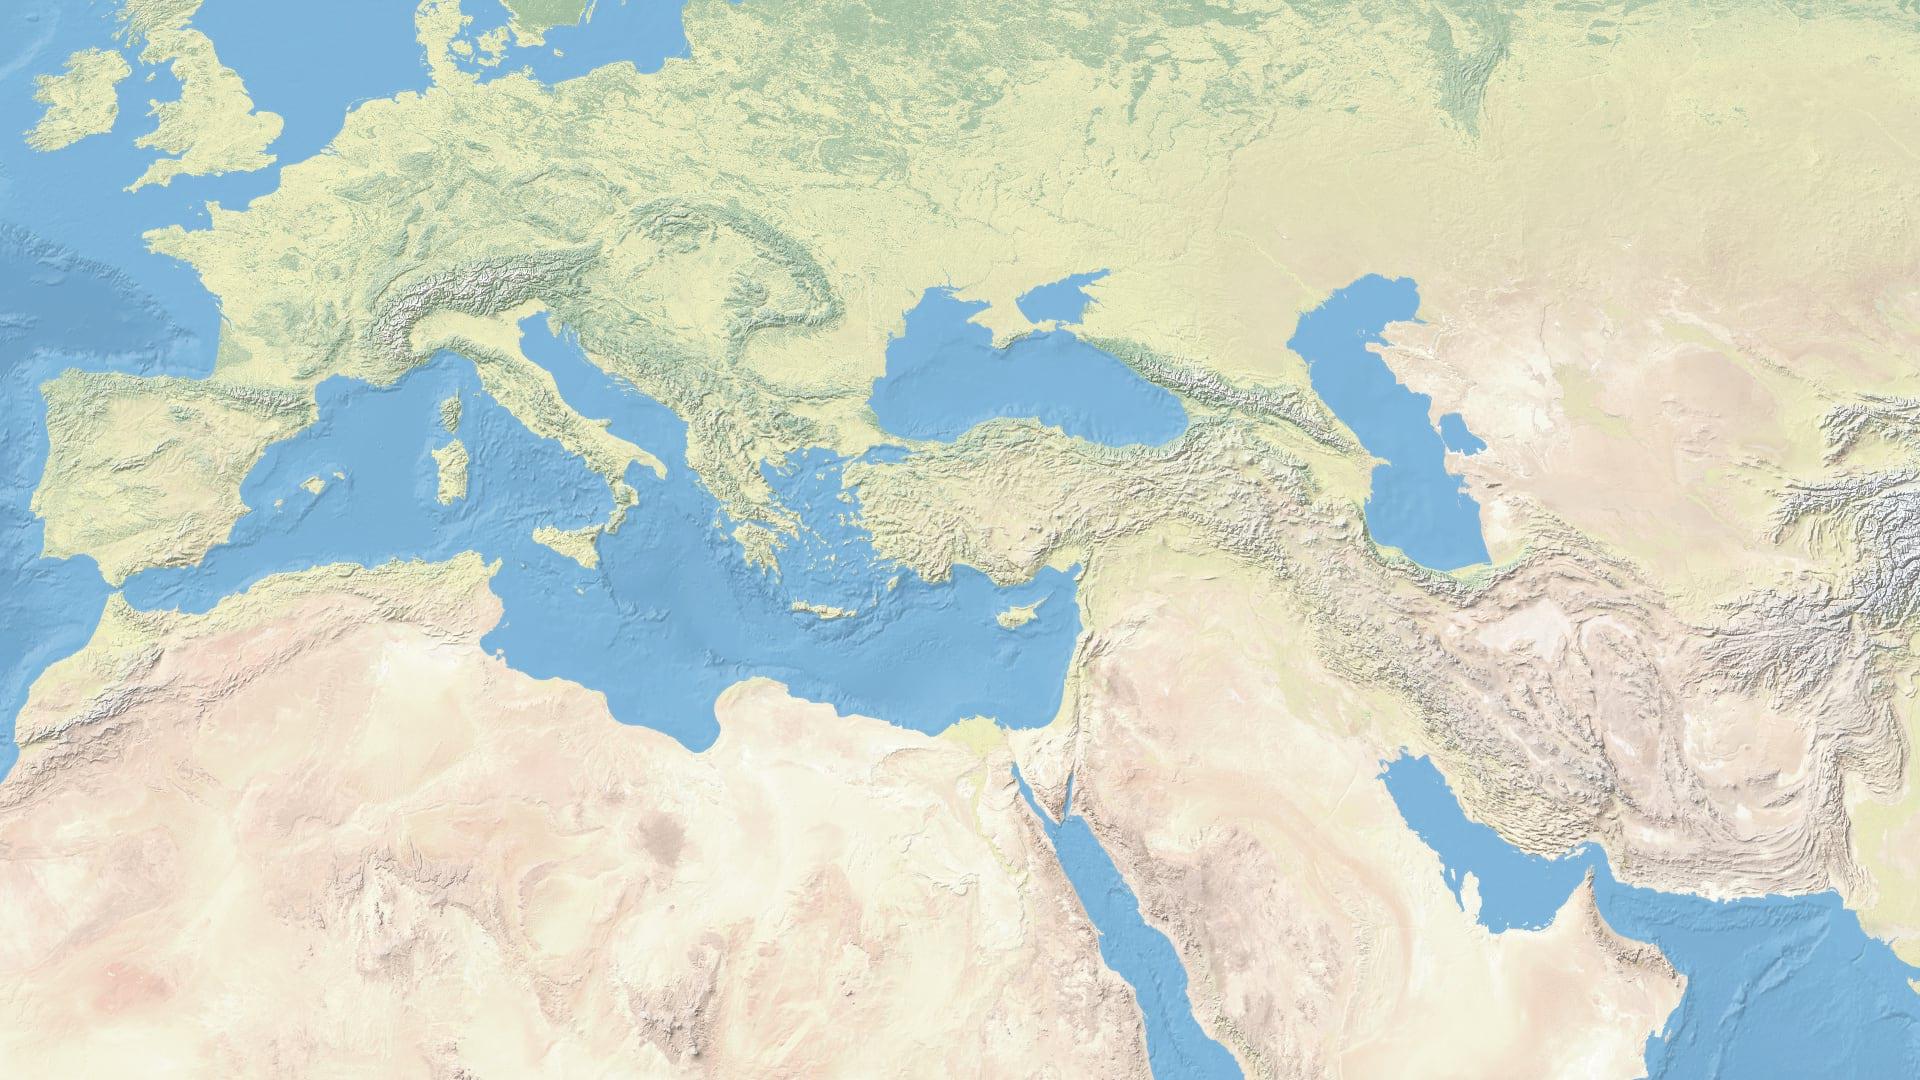 Natural Earth terrain and landcover basemap.